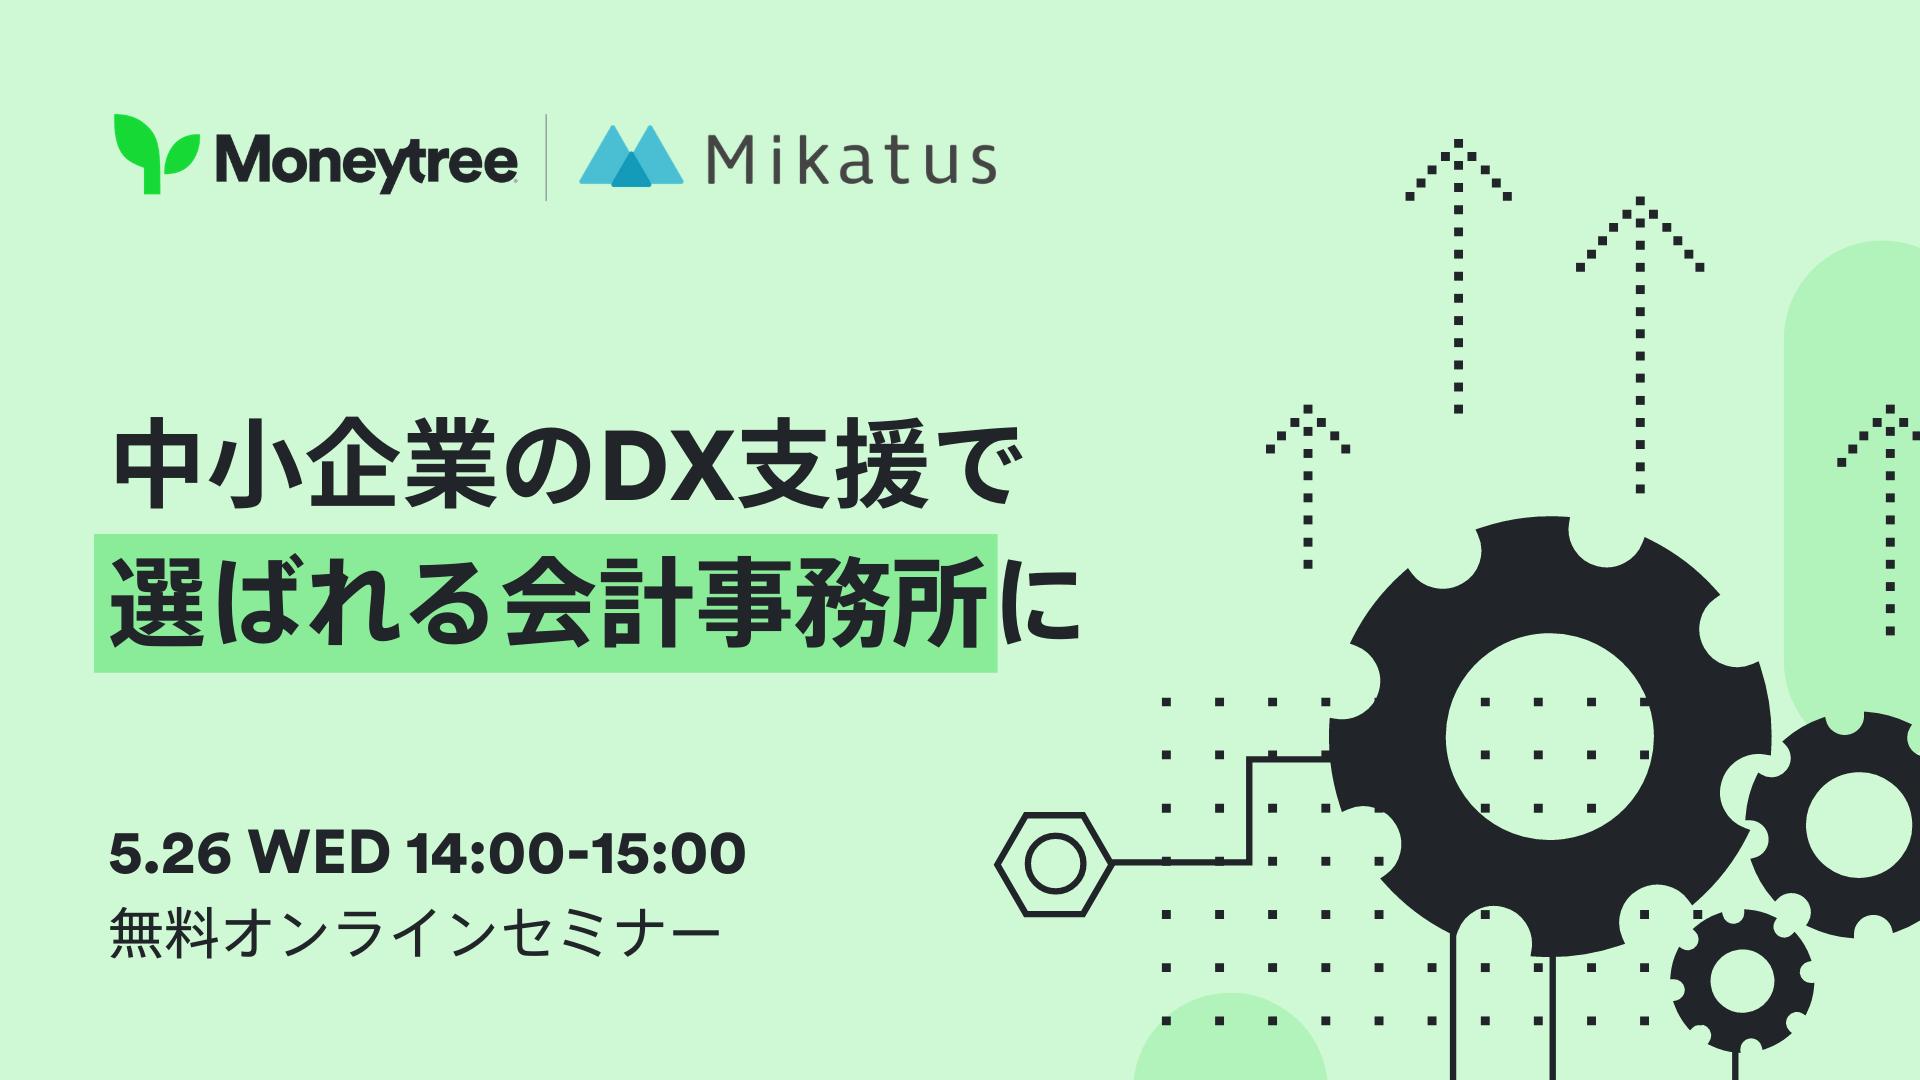 Moneytree x Mikatus 中小企業のDX支援で選ばれる会計選ばれる会計事務所にウェビナー